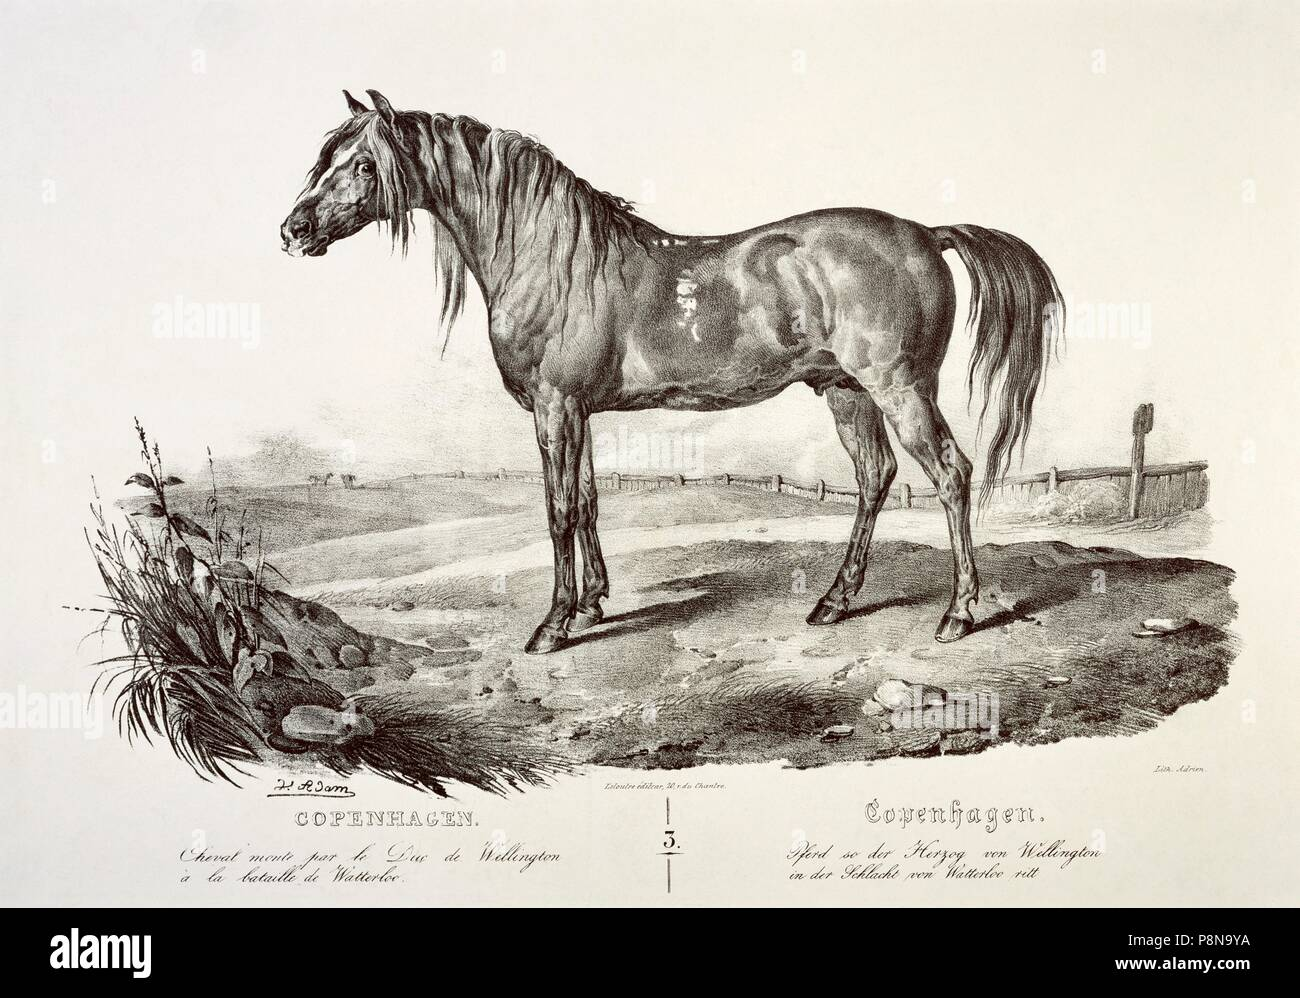 Copenhagen, the Duke of Wellington's horse, 19th century. Engraving in Apsley House, London. - Stock Image